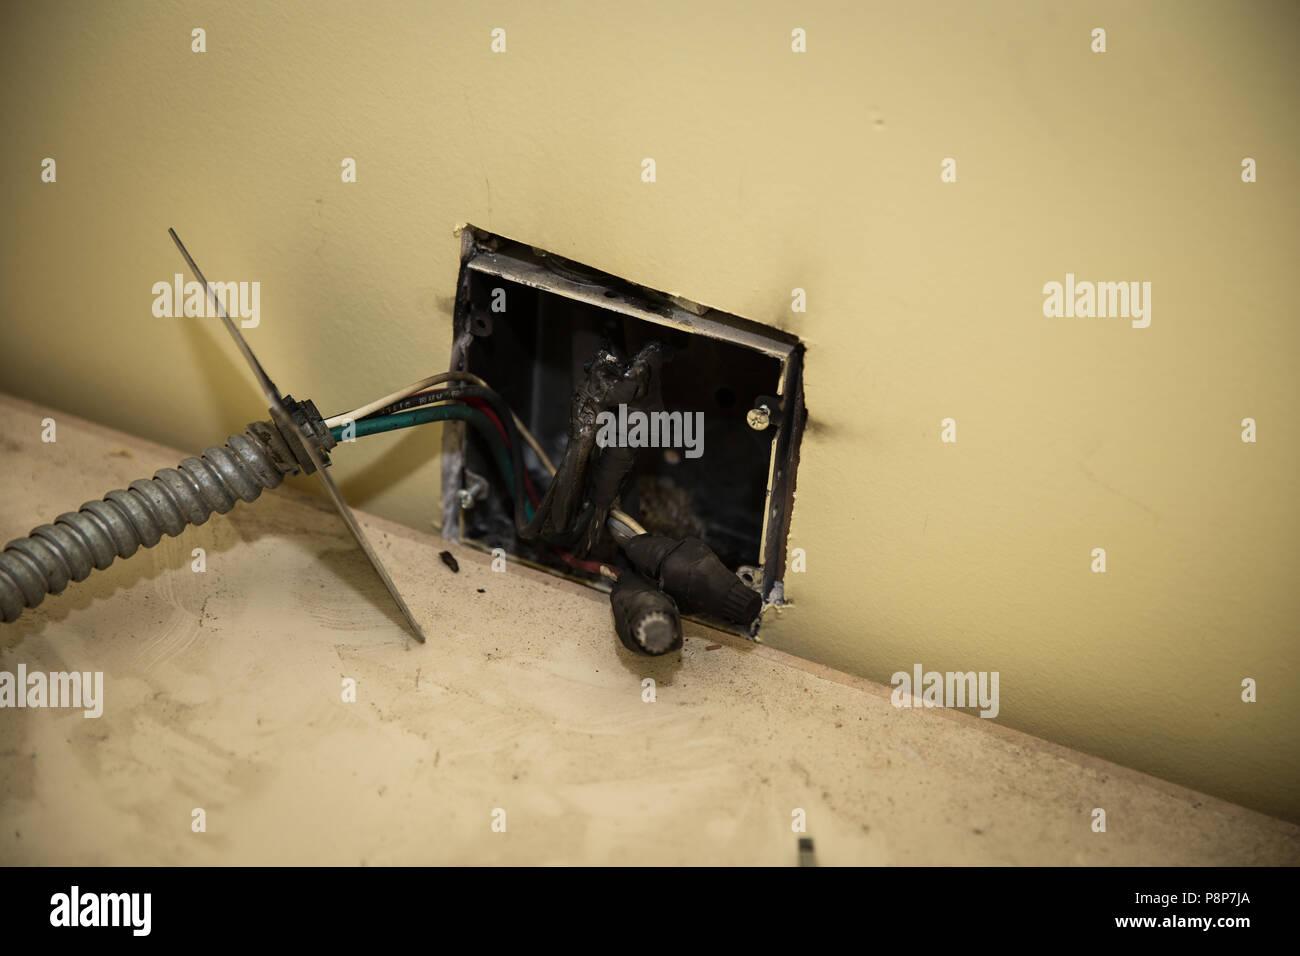 Faulty Wiring Stockfotos & Faulty Wiring Bilder - Alamy